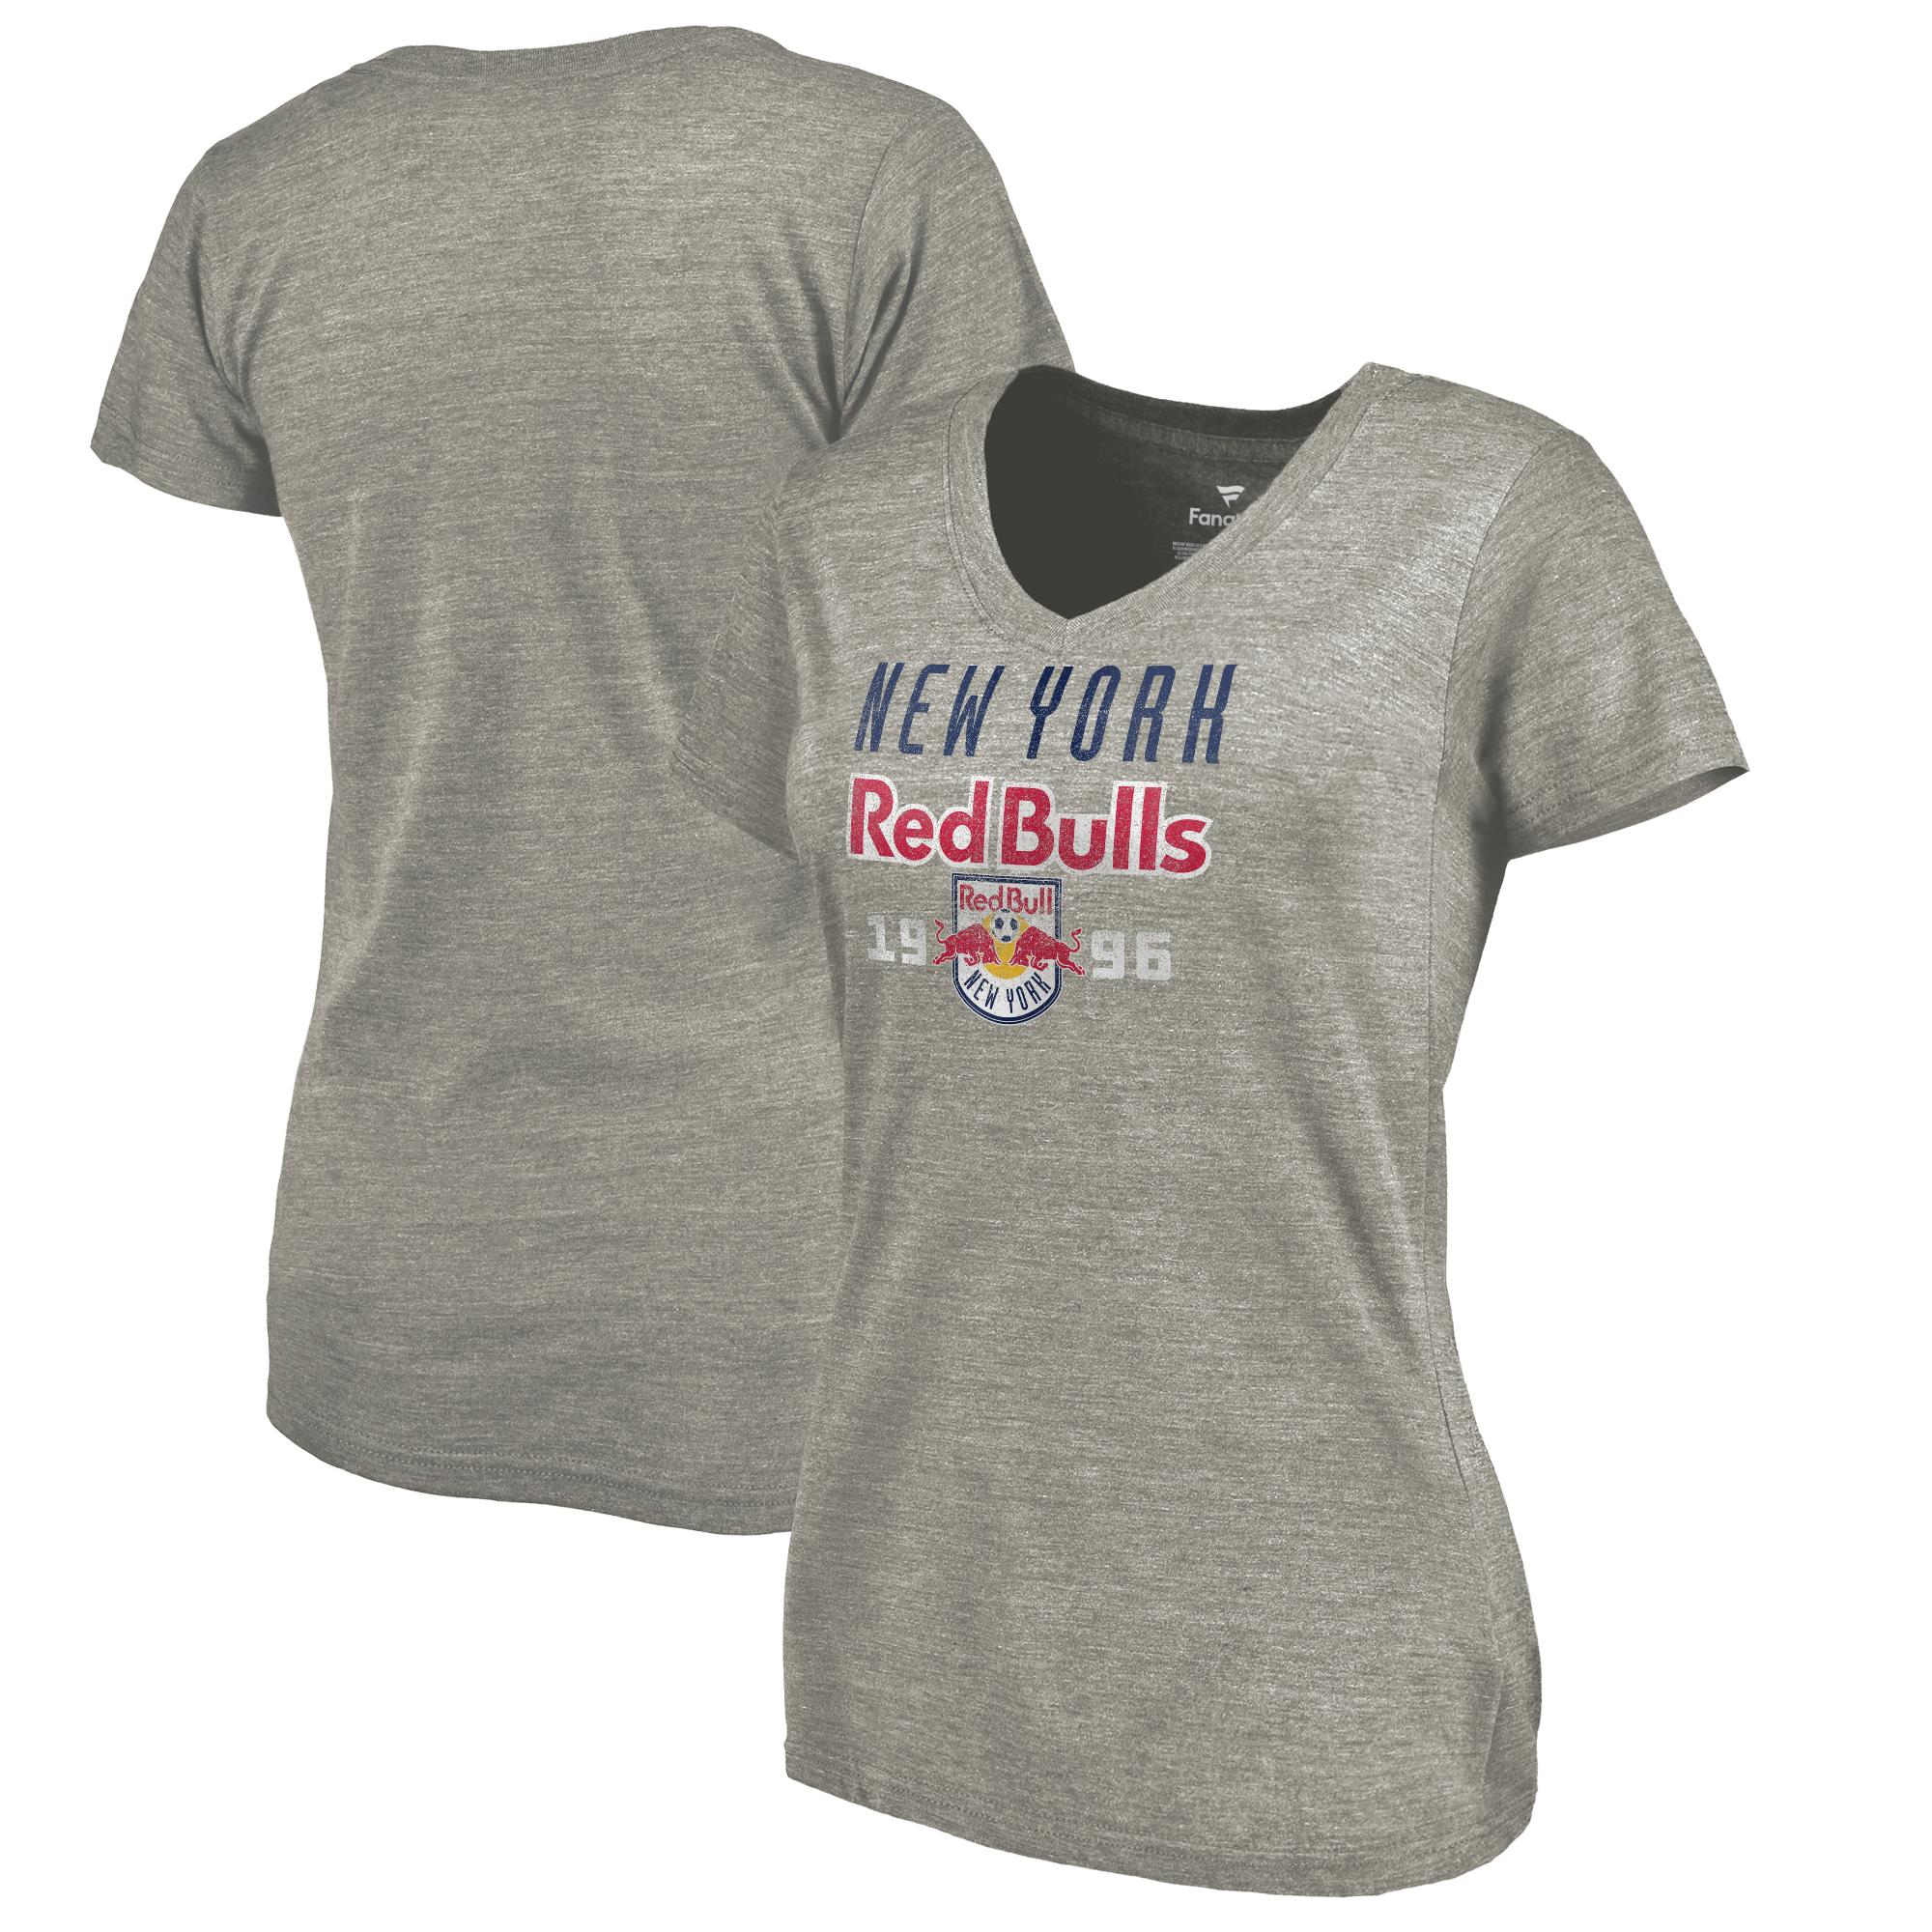 New York Red Bulls Fanatics Branded Women's Antique Stack Tri-Blend V-Neck T-Shirt - Heathered Gray